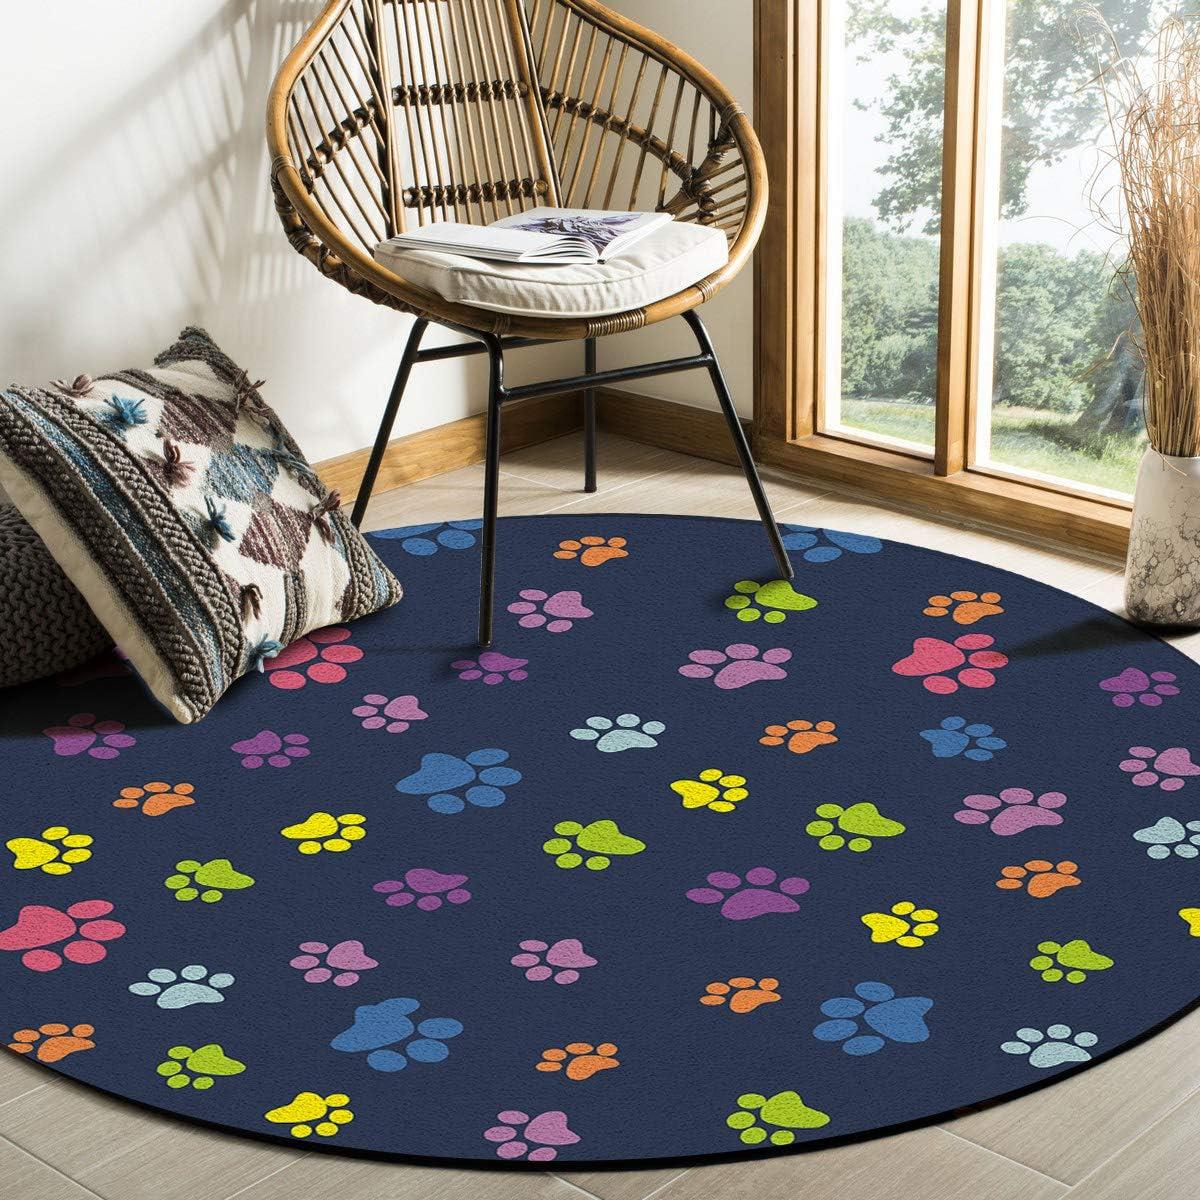 Funny Dogs /& Motorcycle Round Area Rug Bedroom Floor Carpet Memory Foam Yoga Mat